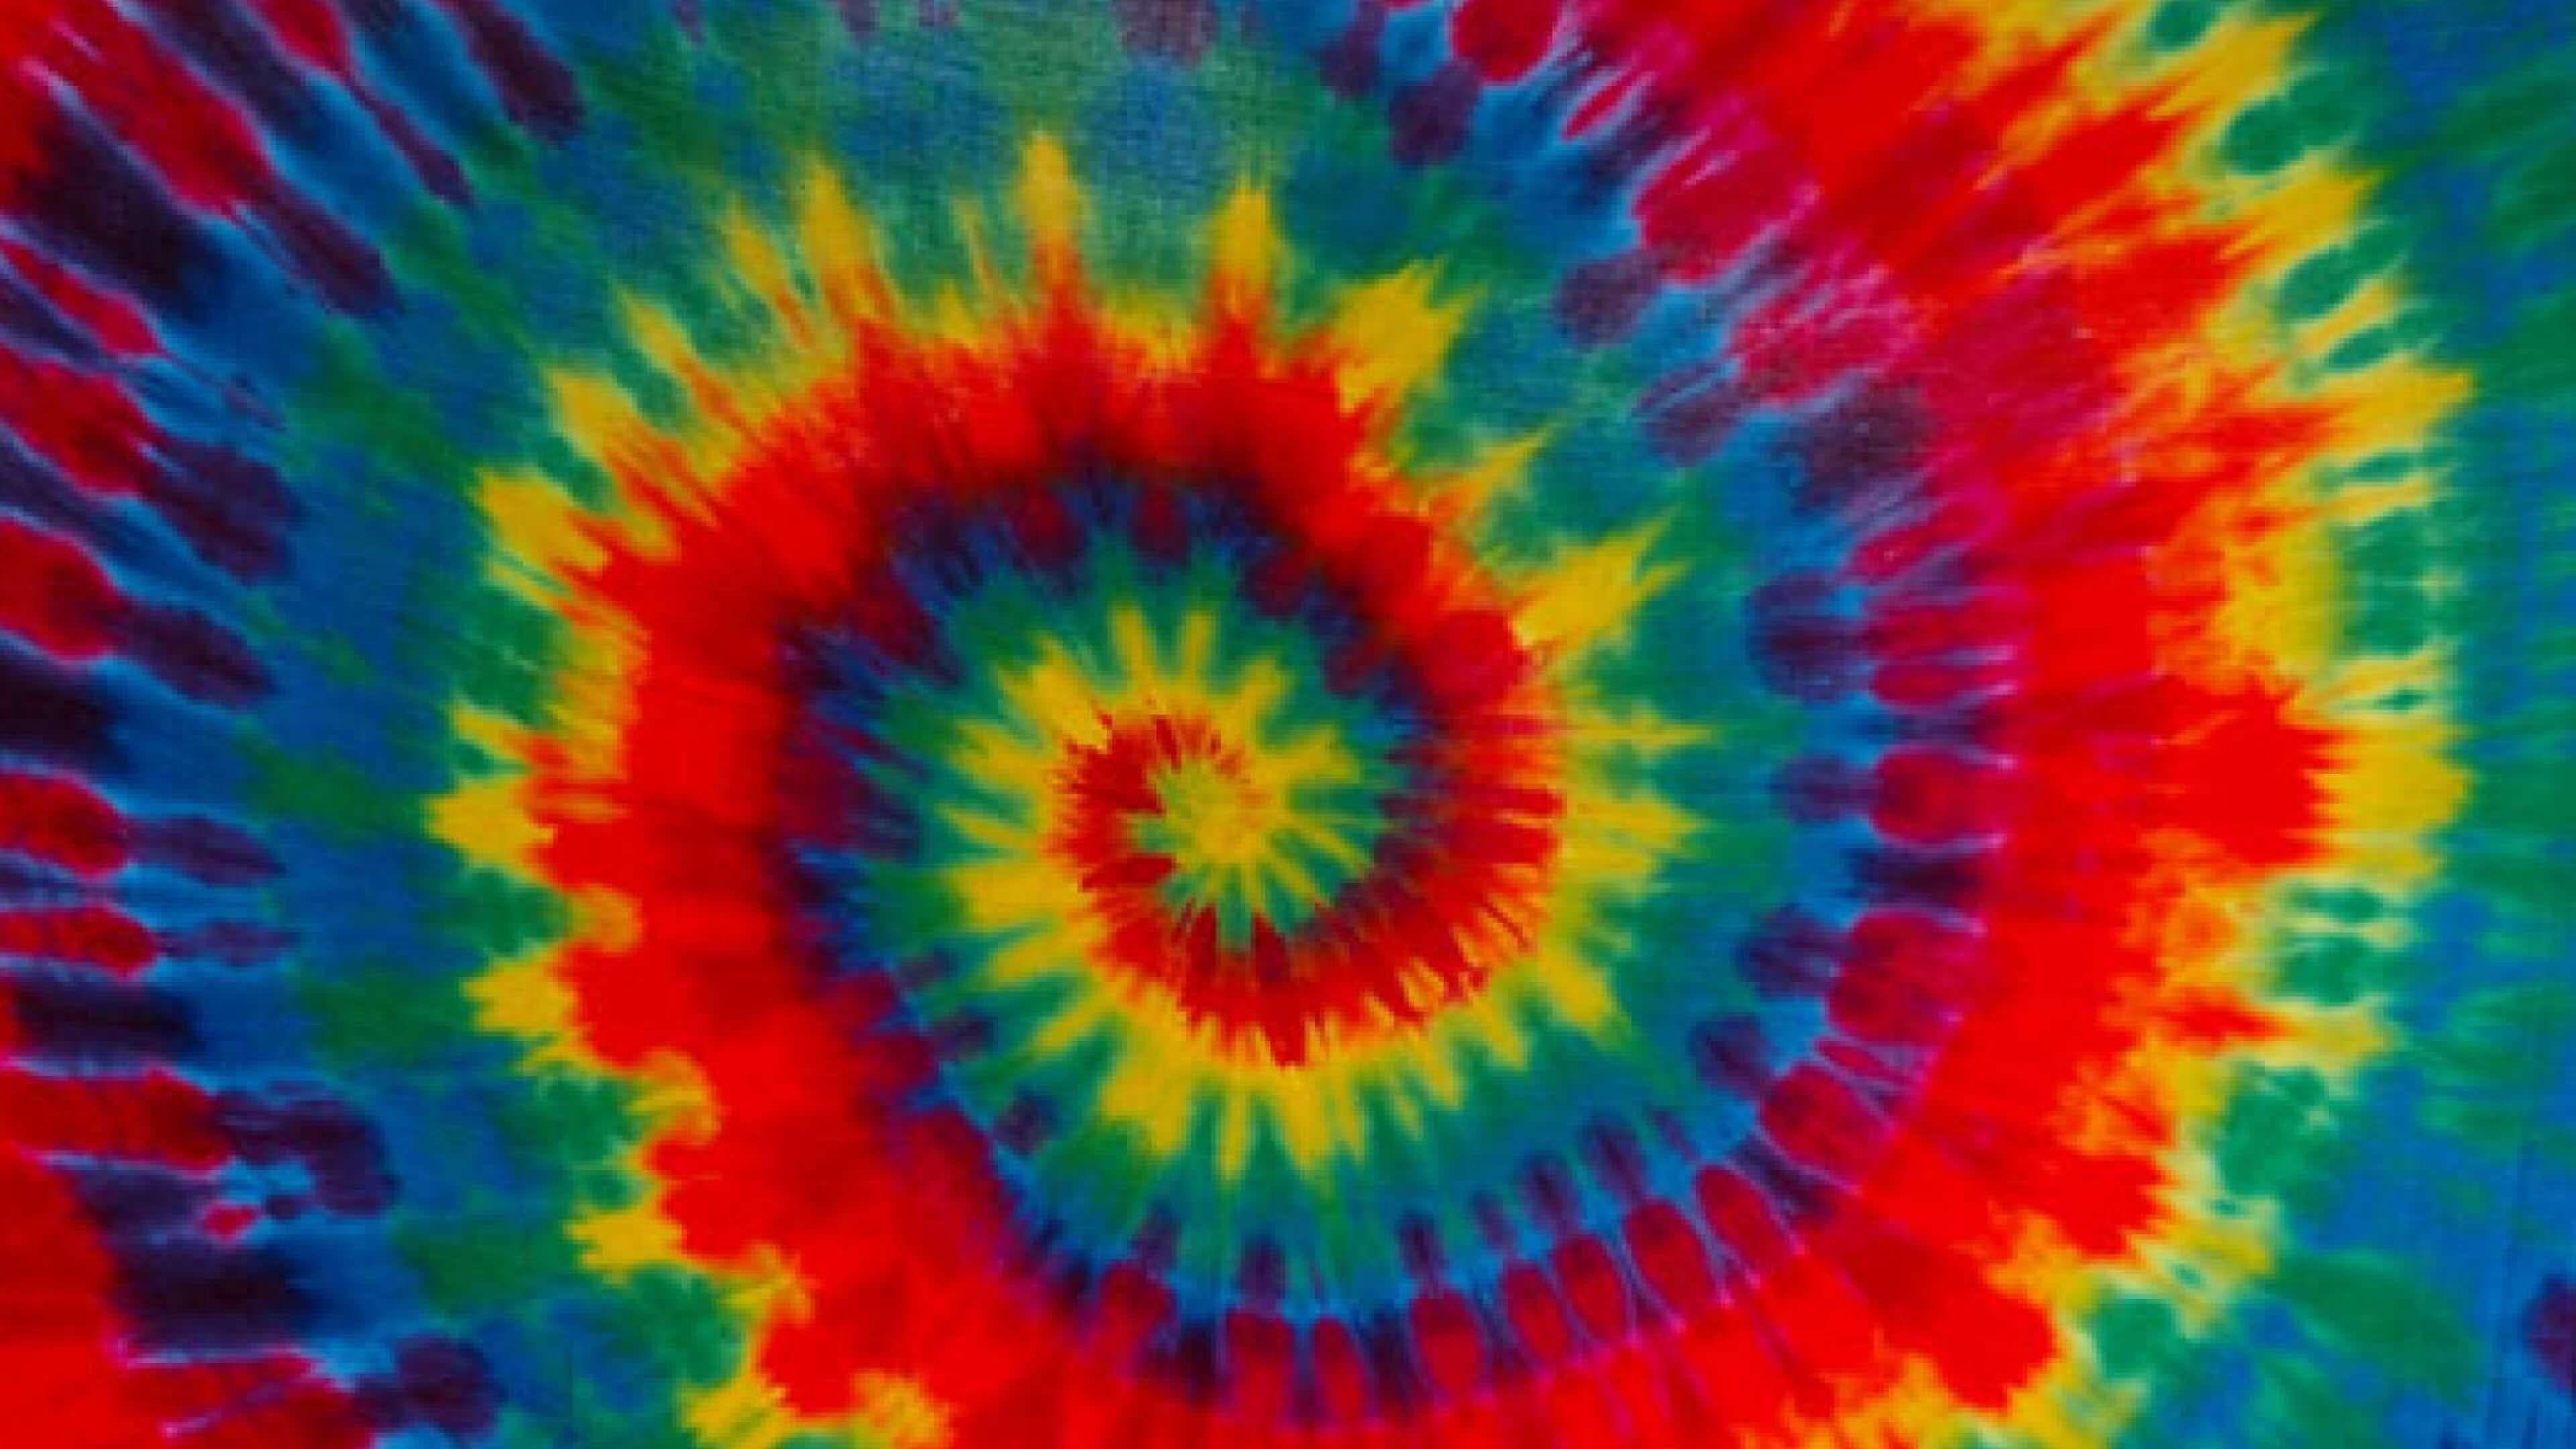 Tie Dye Wallpaper 52 images 3840x2160